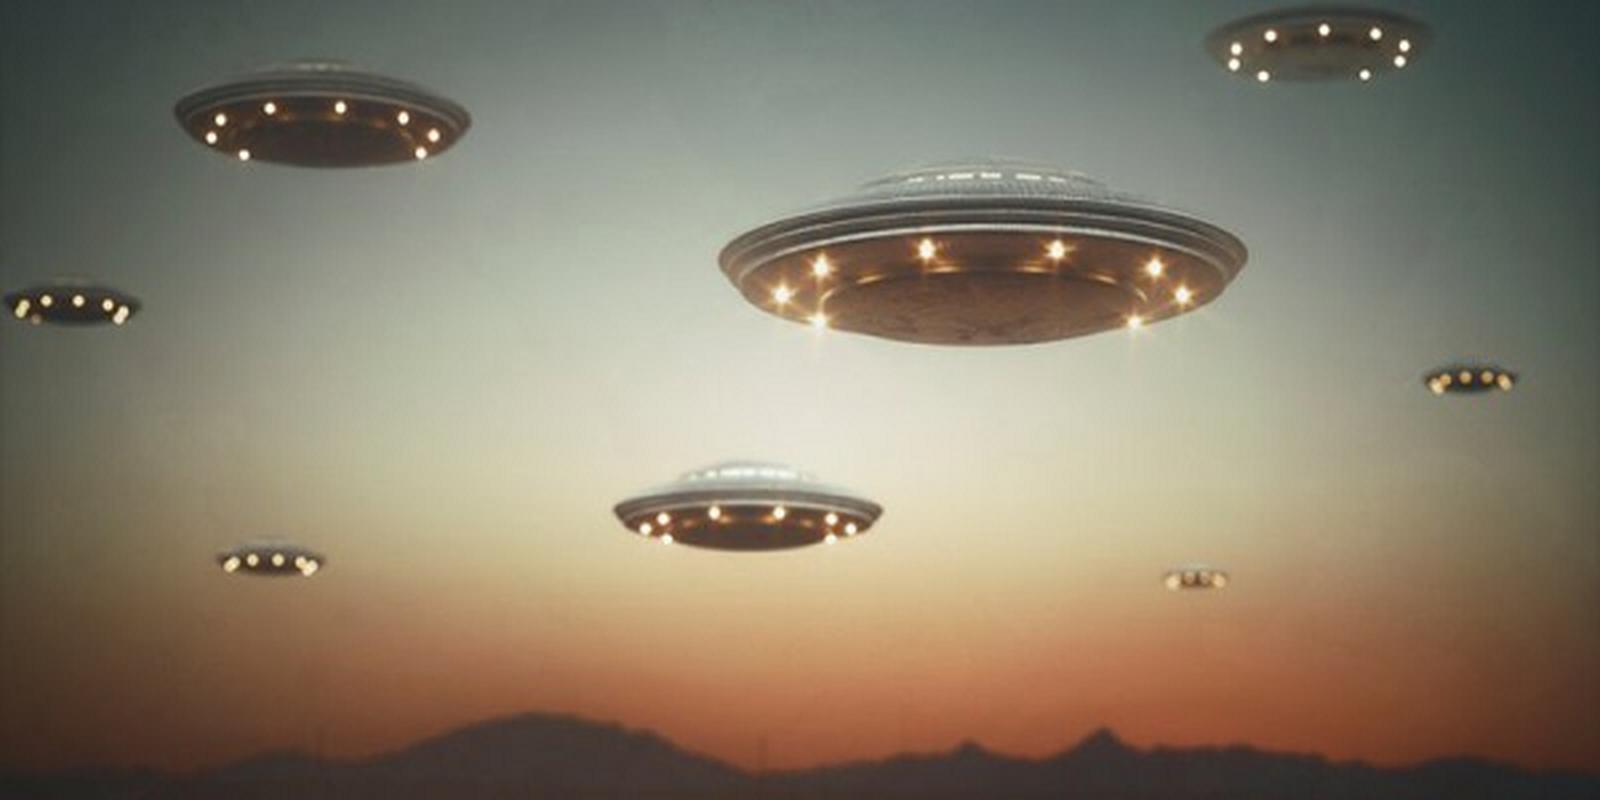 Tiet lo soc: UFO troi len tu day bien khien con nguoi kho